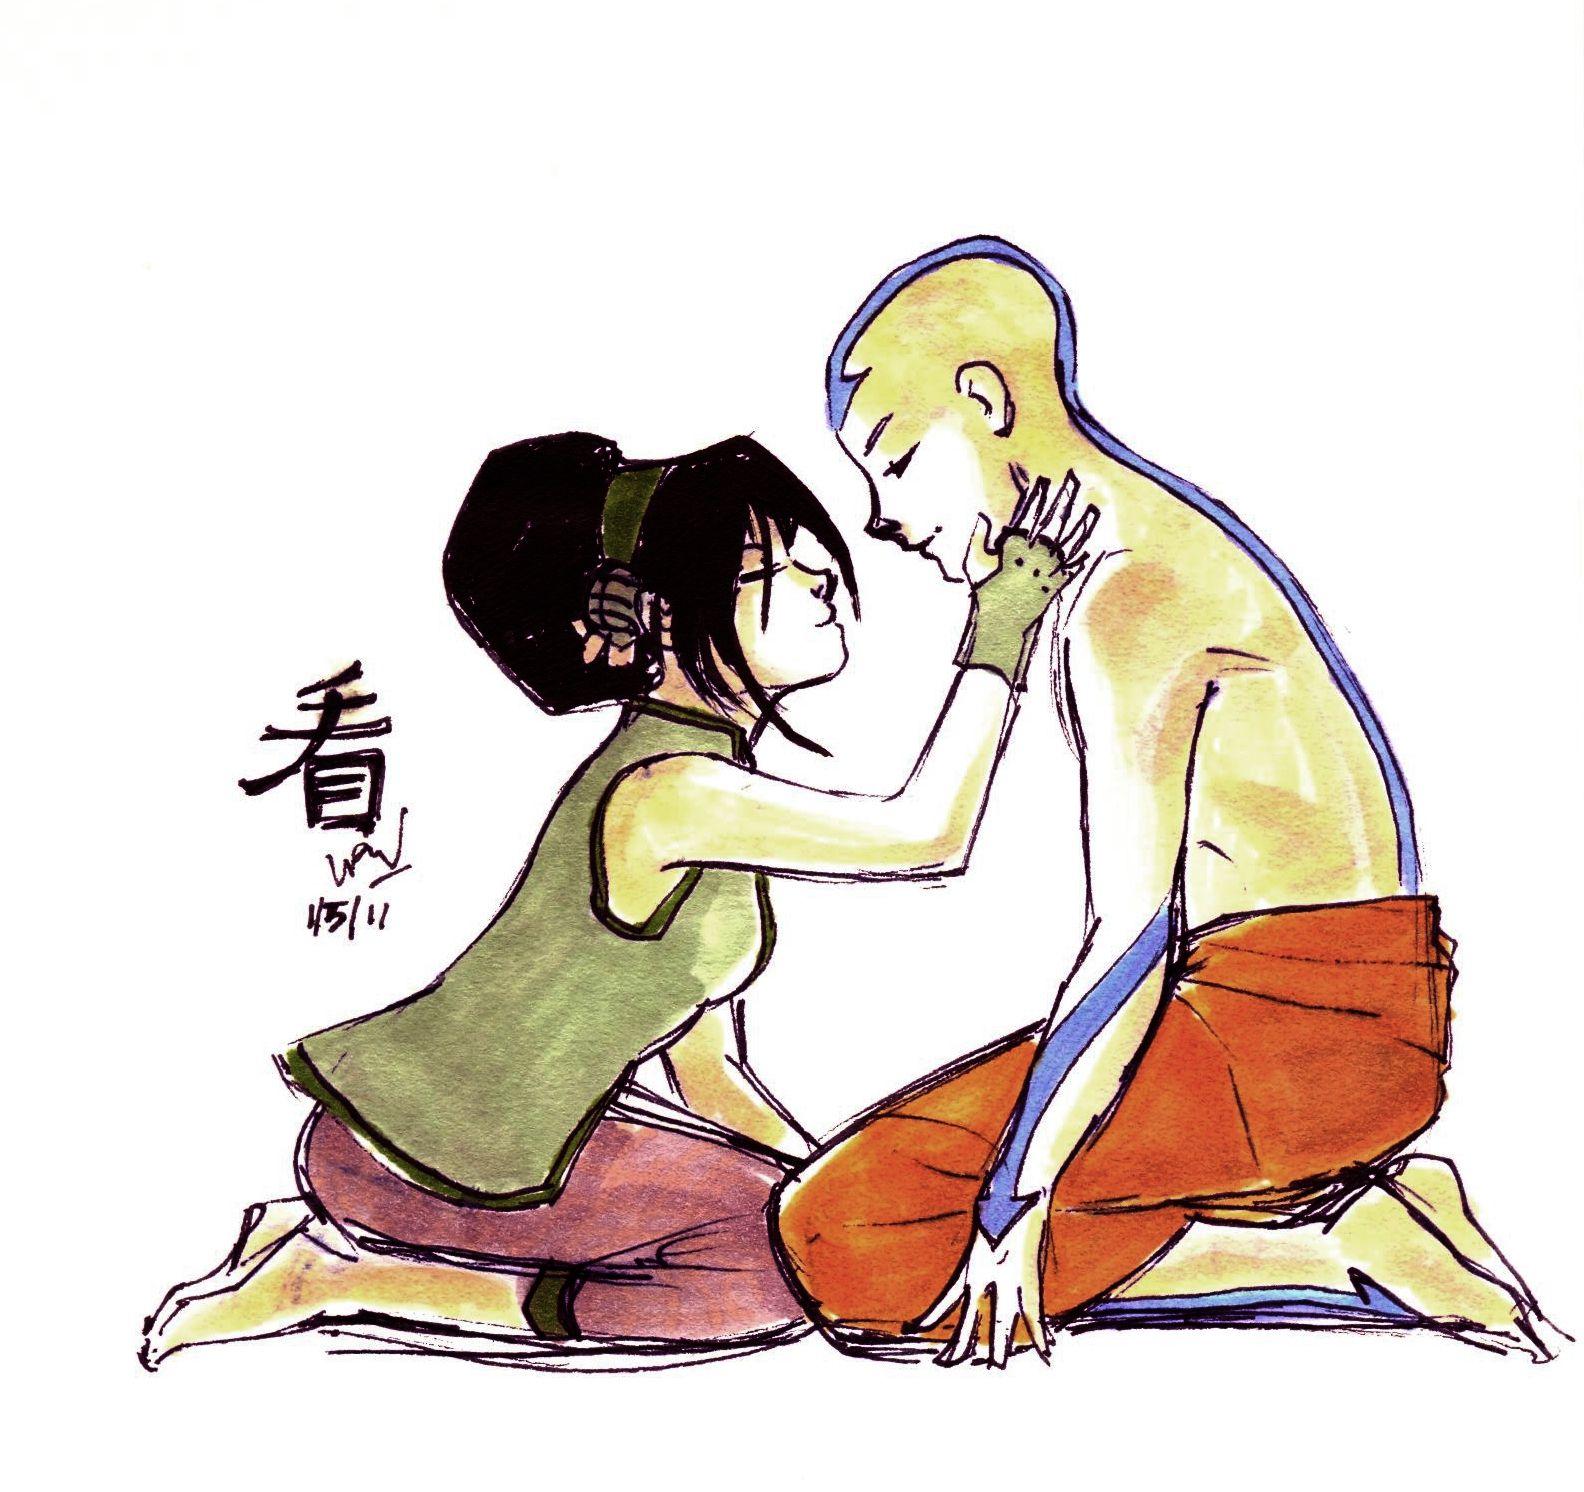 Avatar the Last Airbender - Avatar Aang x Toph Bei Fong - Look by imaginarium on deviantART